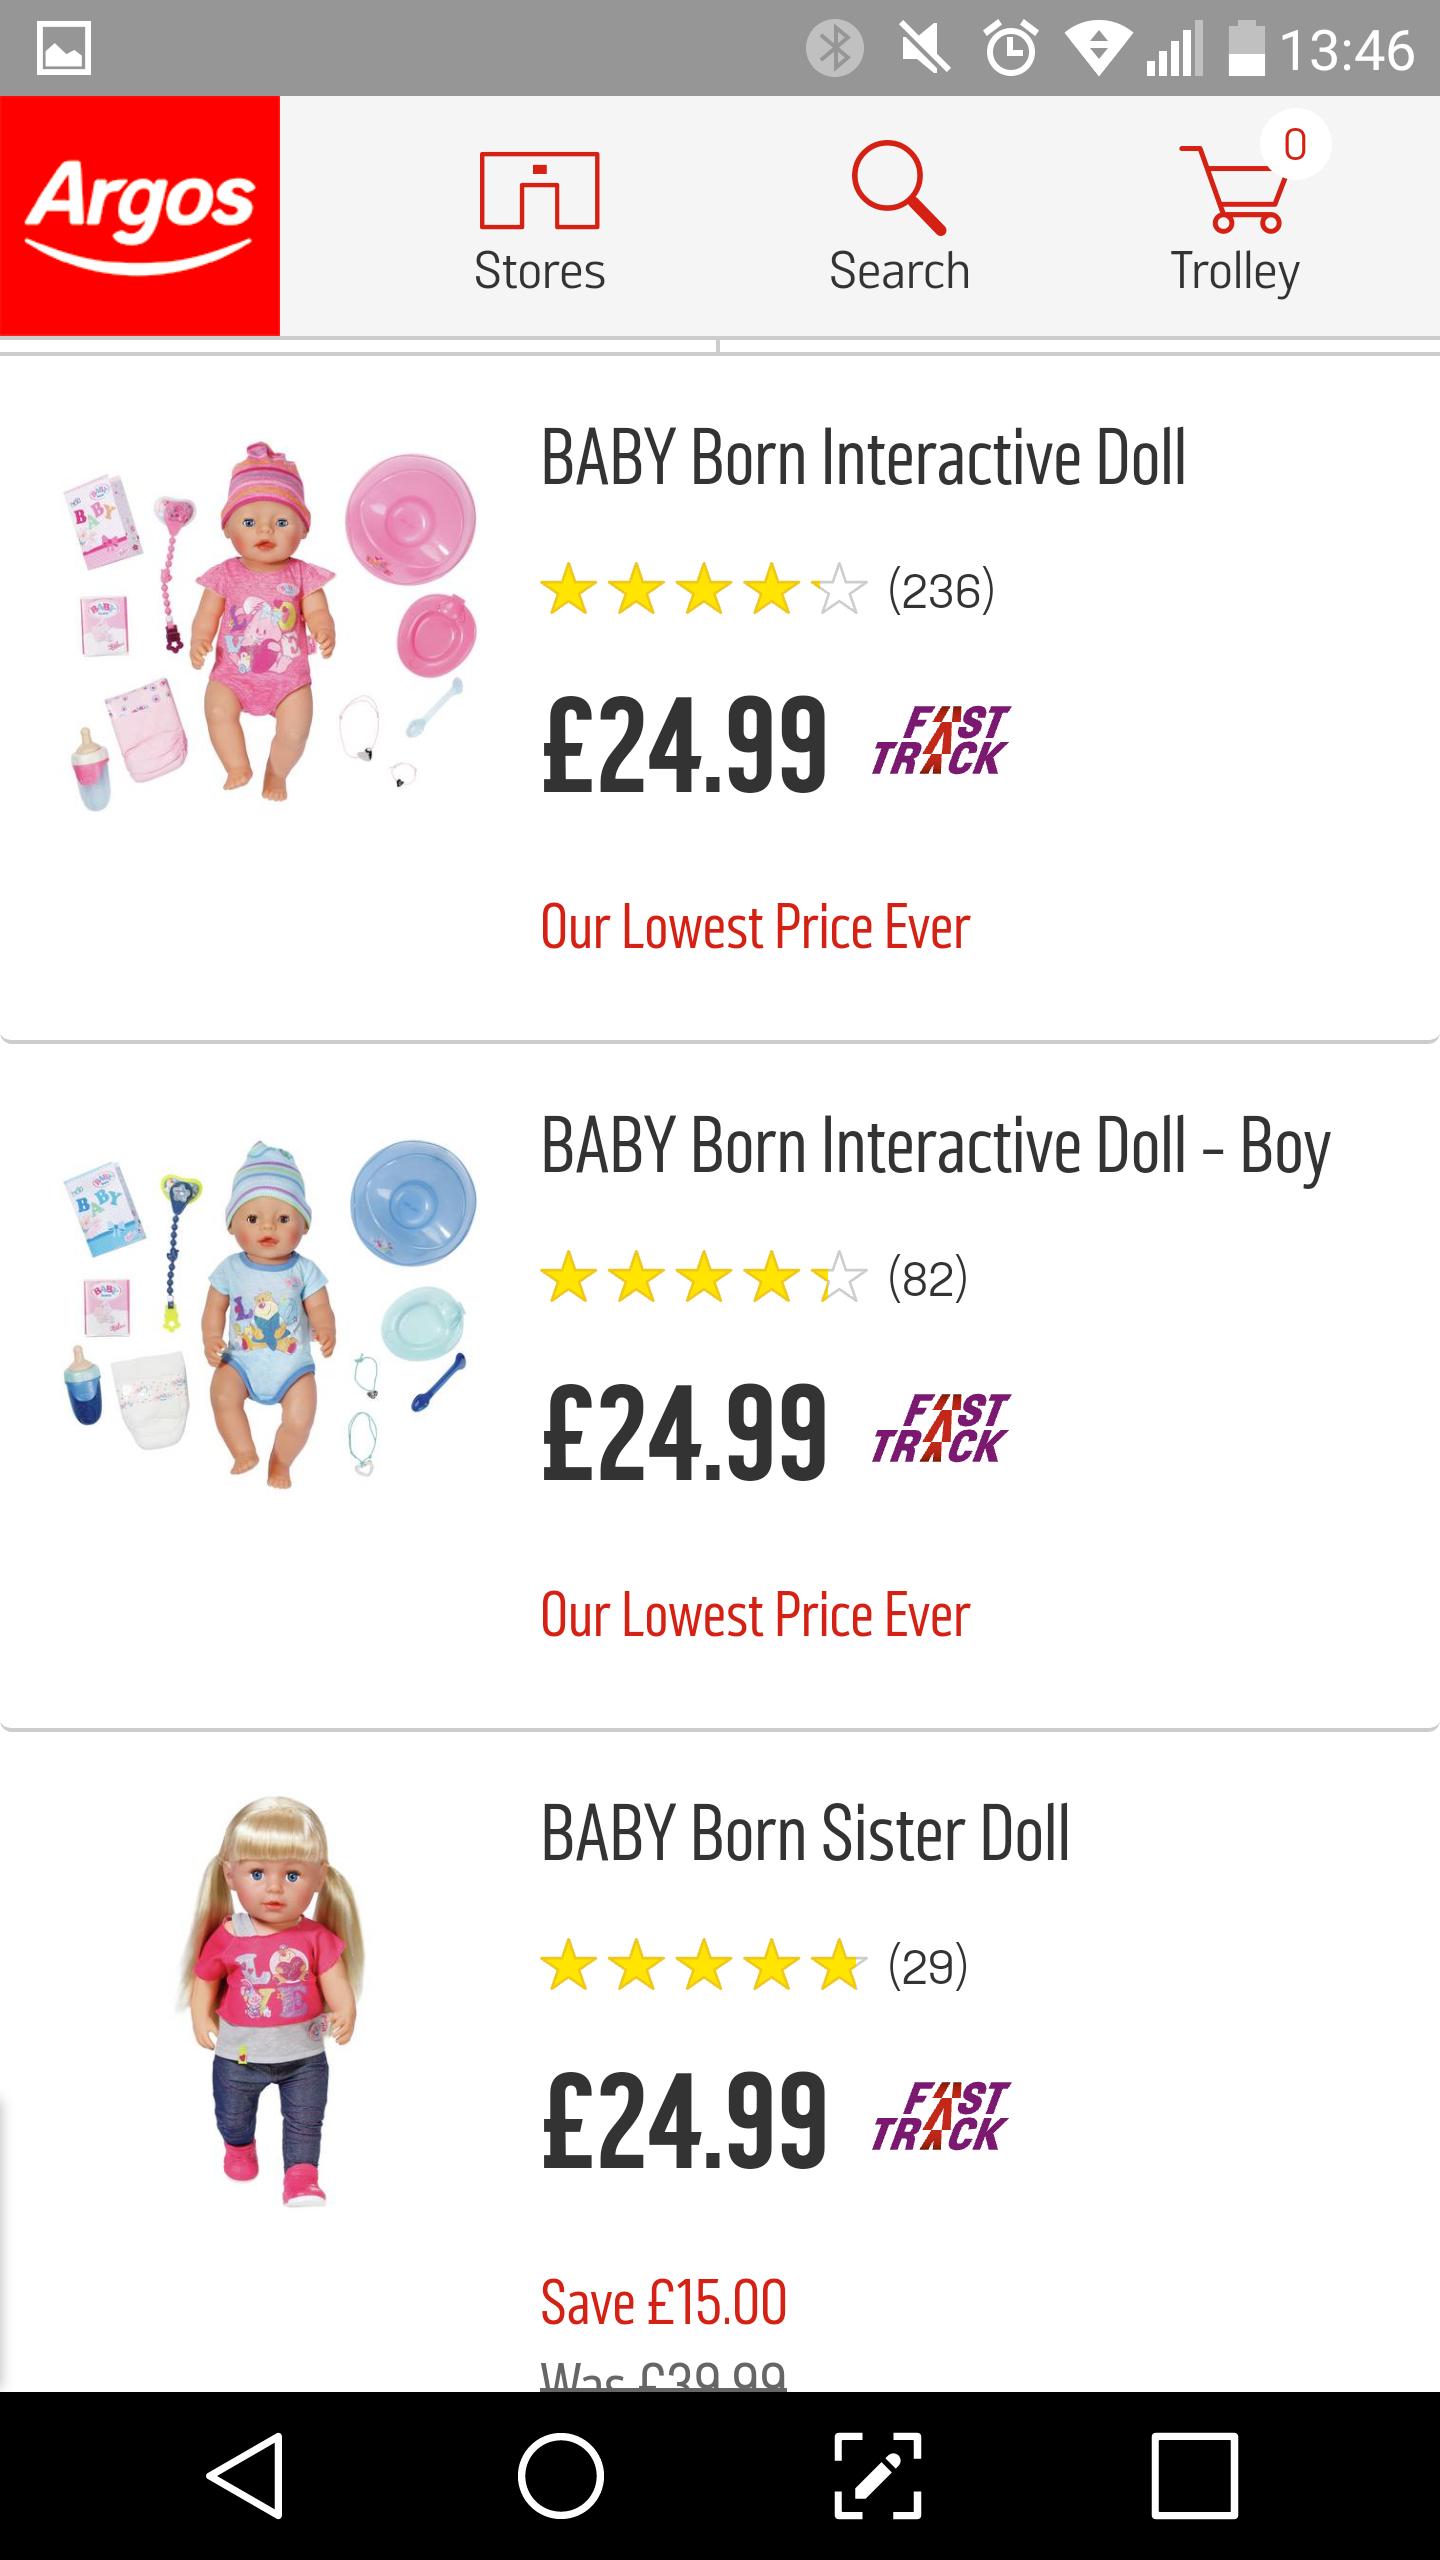 Baby born dolls £24.99 each at Argos